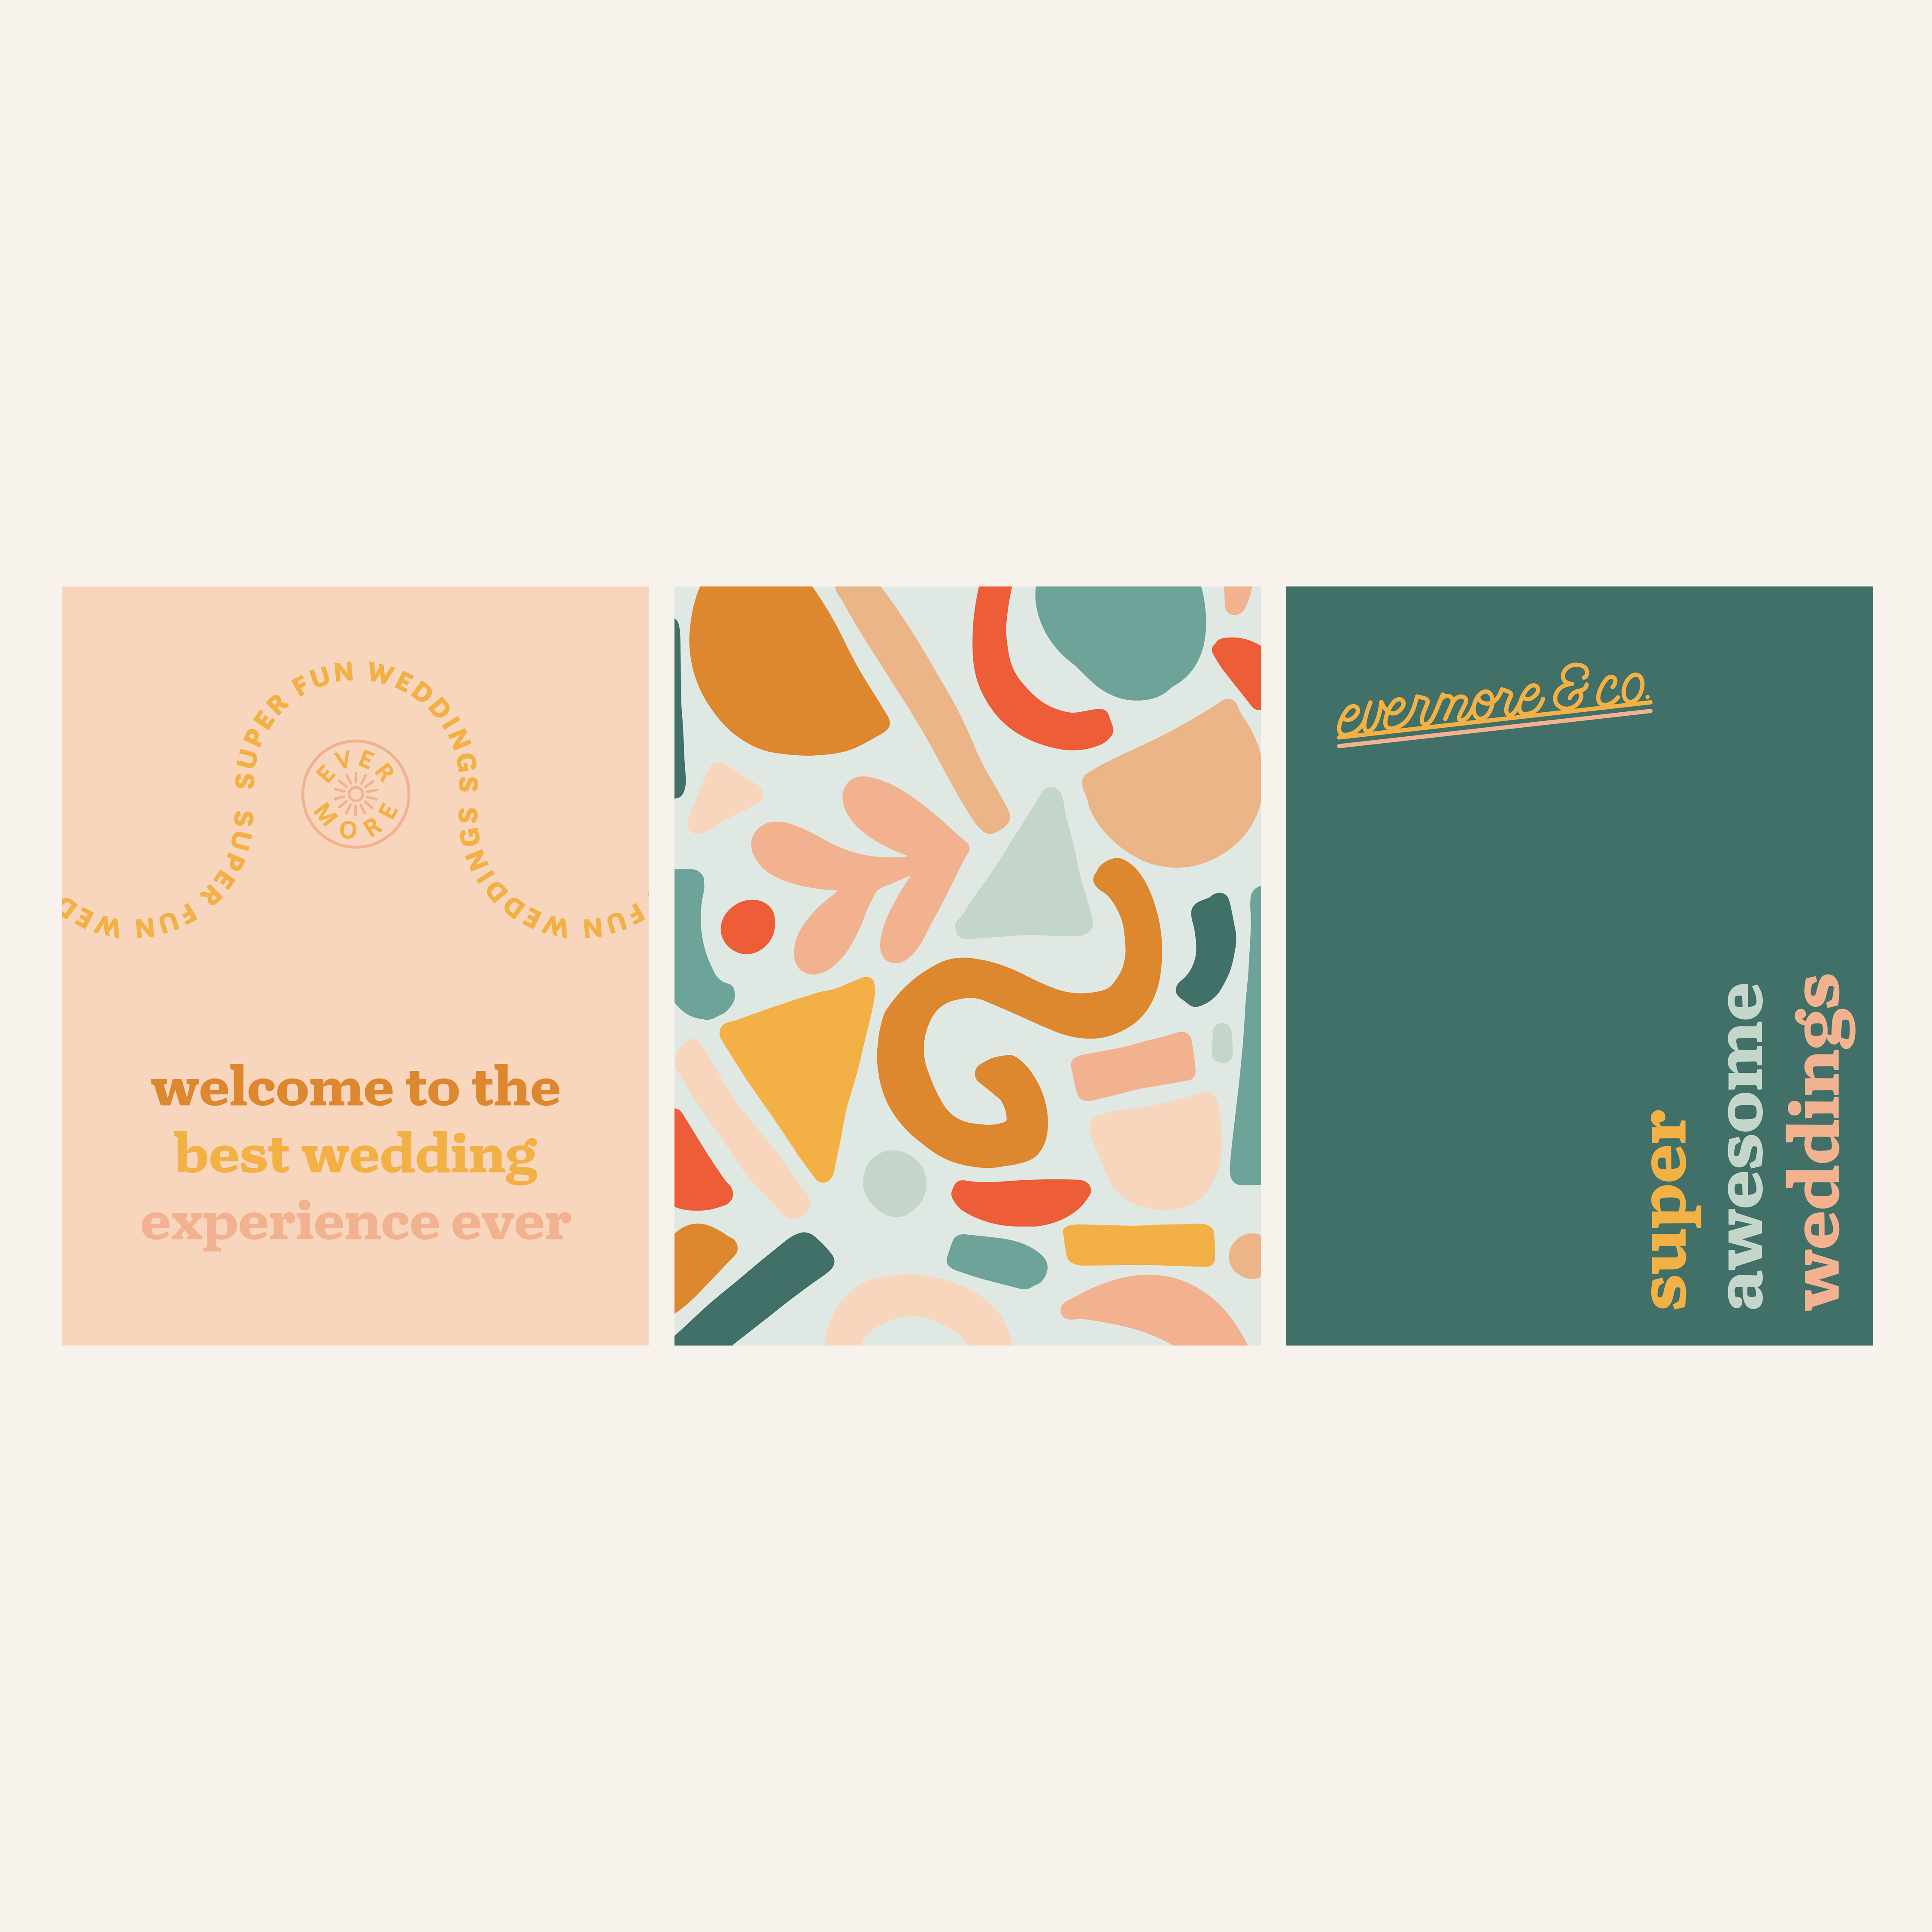 super fun wedding vendor branding design